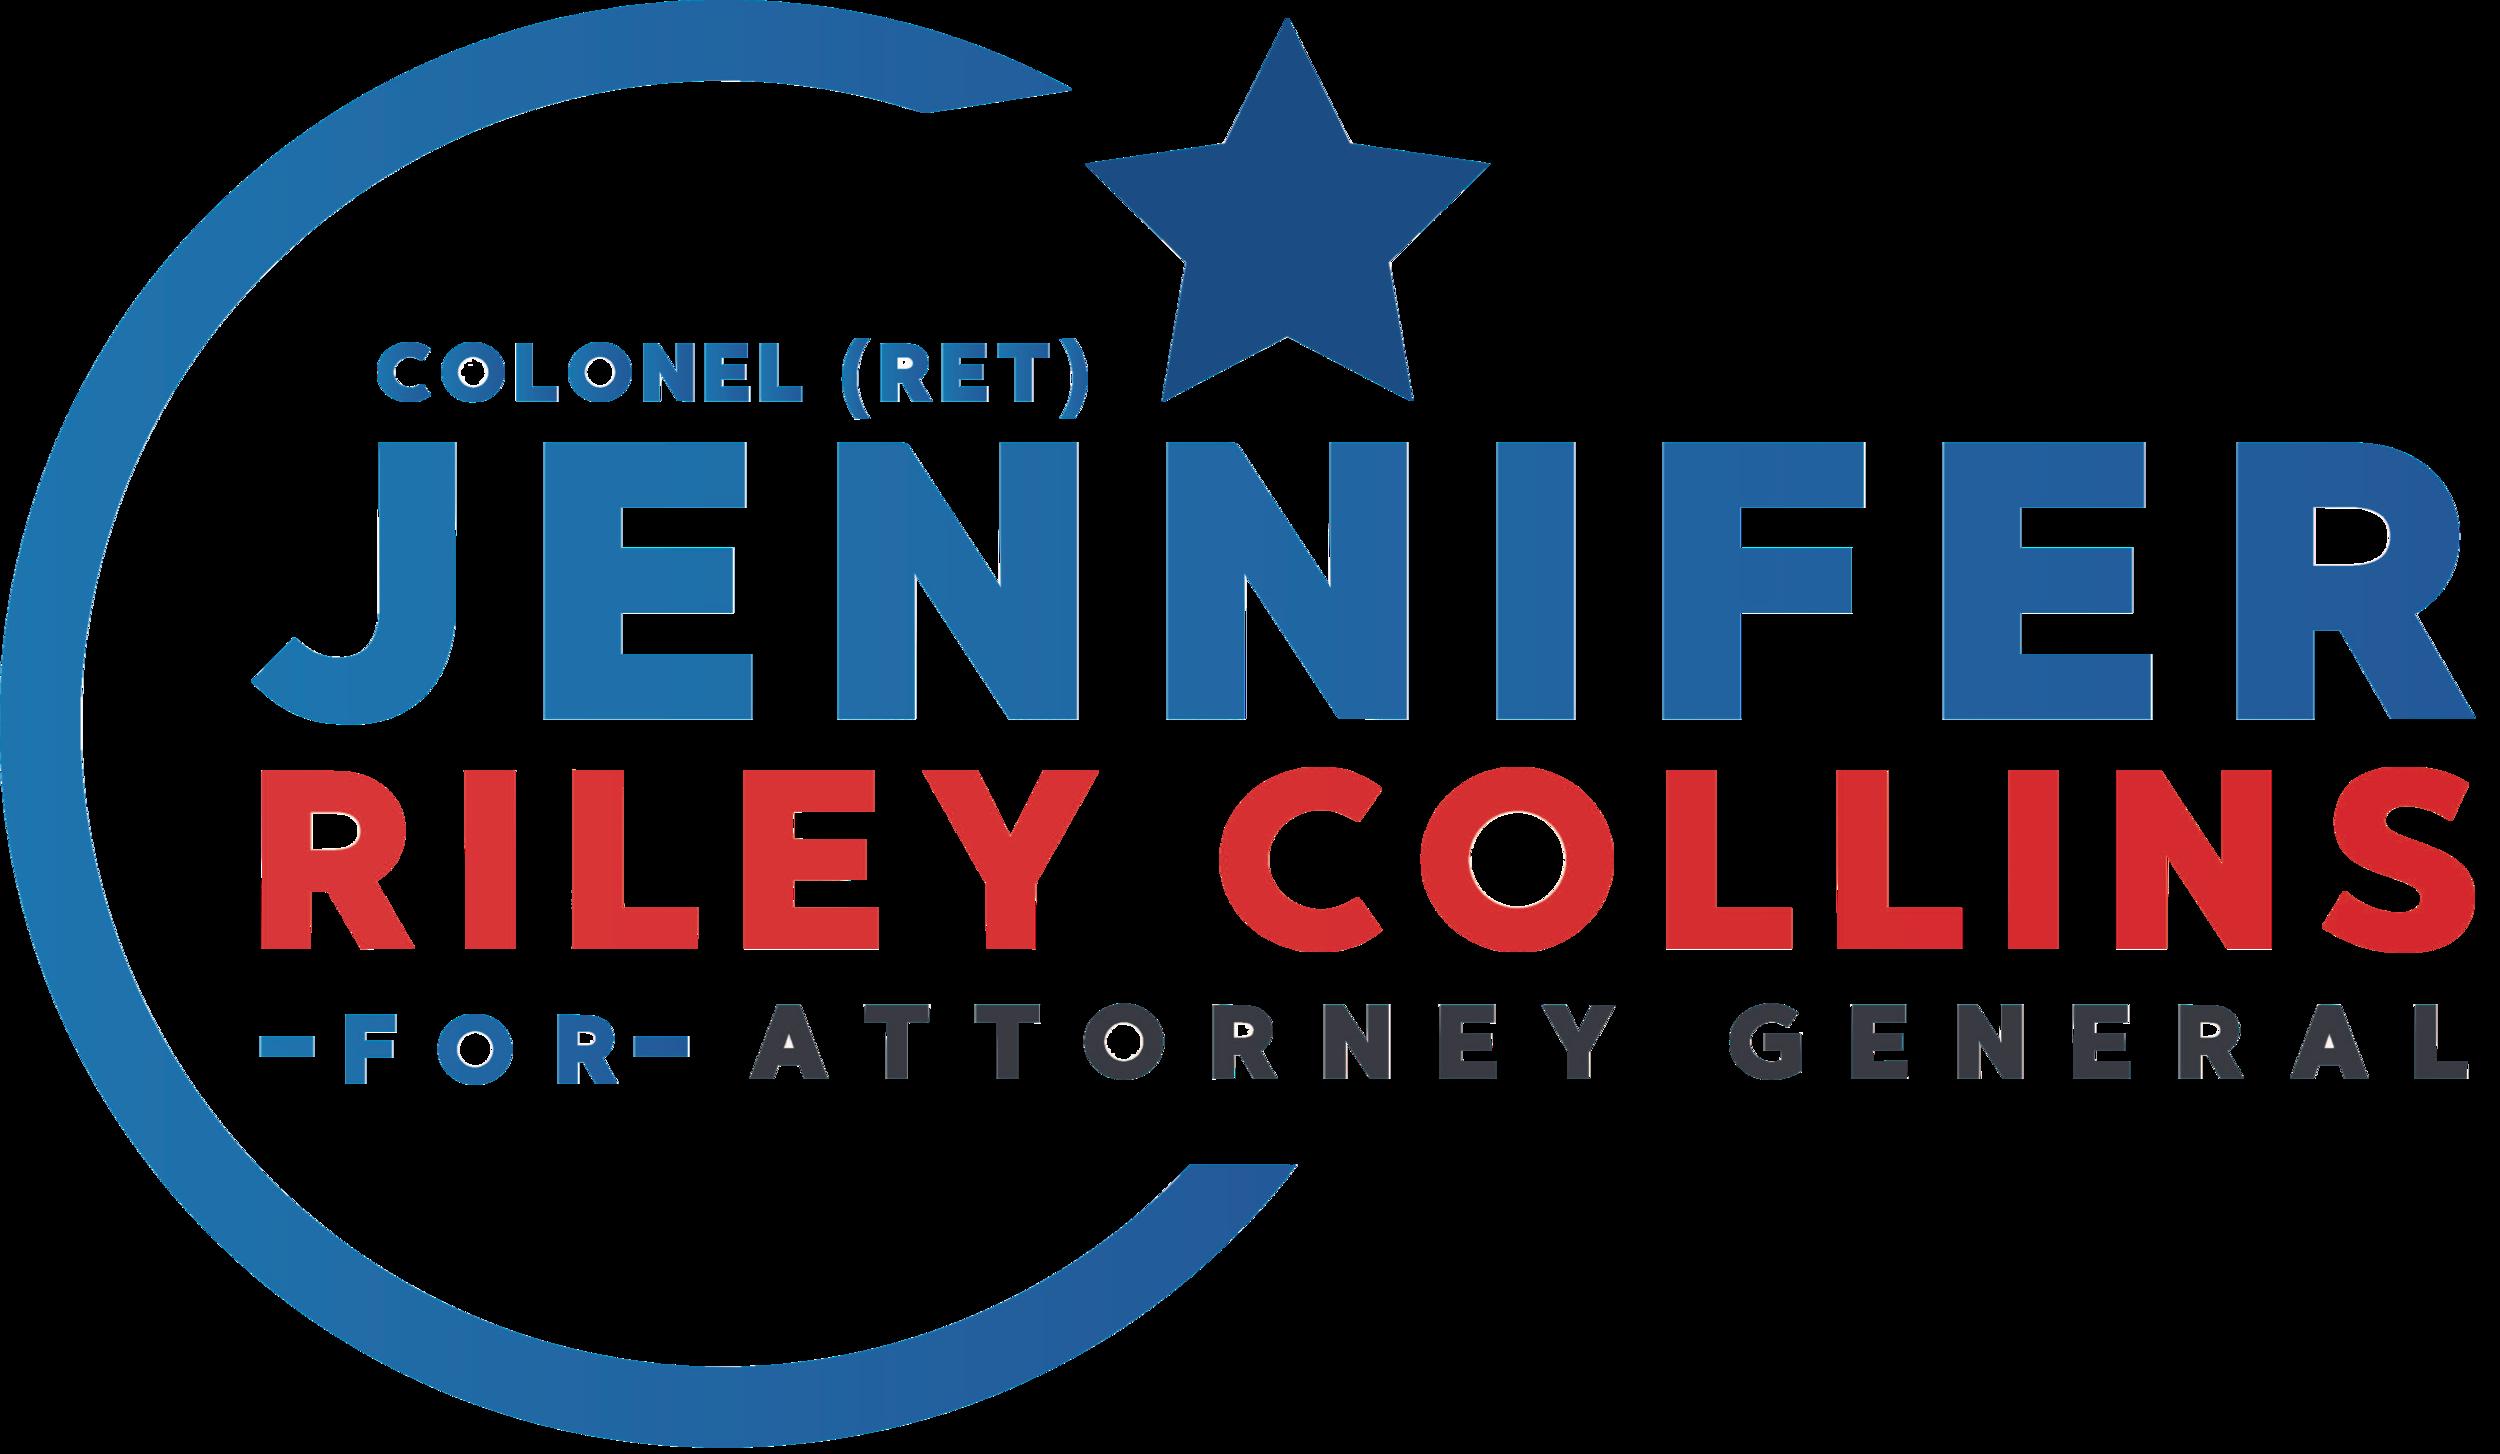 Col. Logo.png